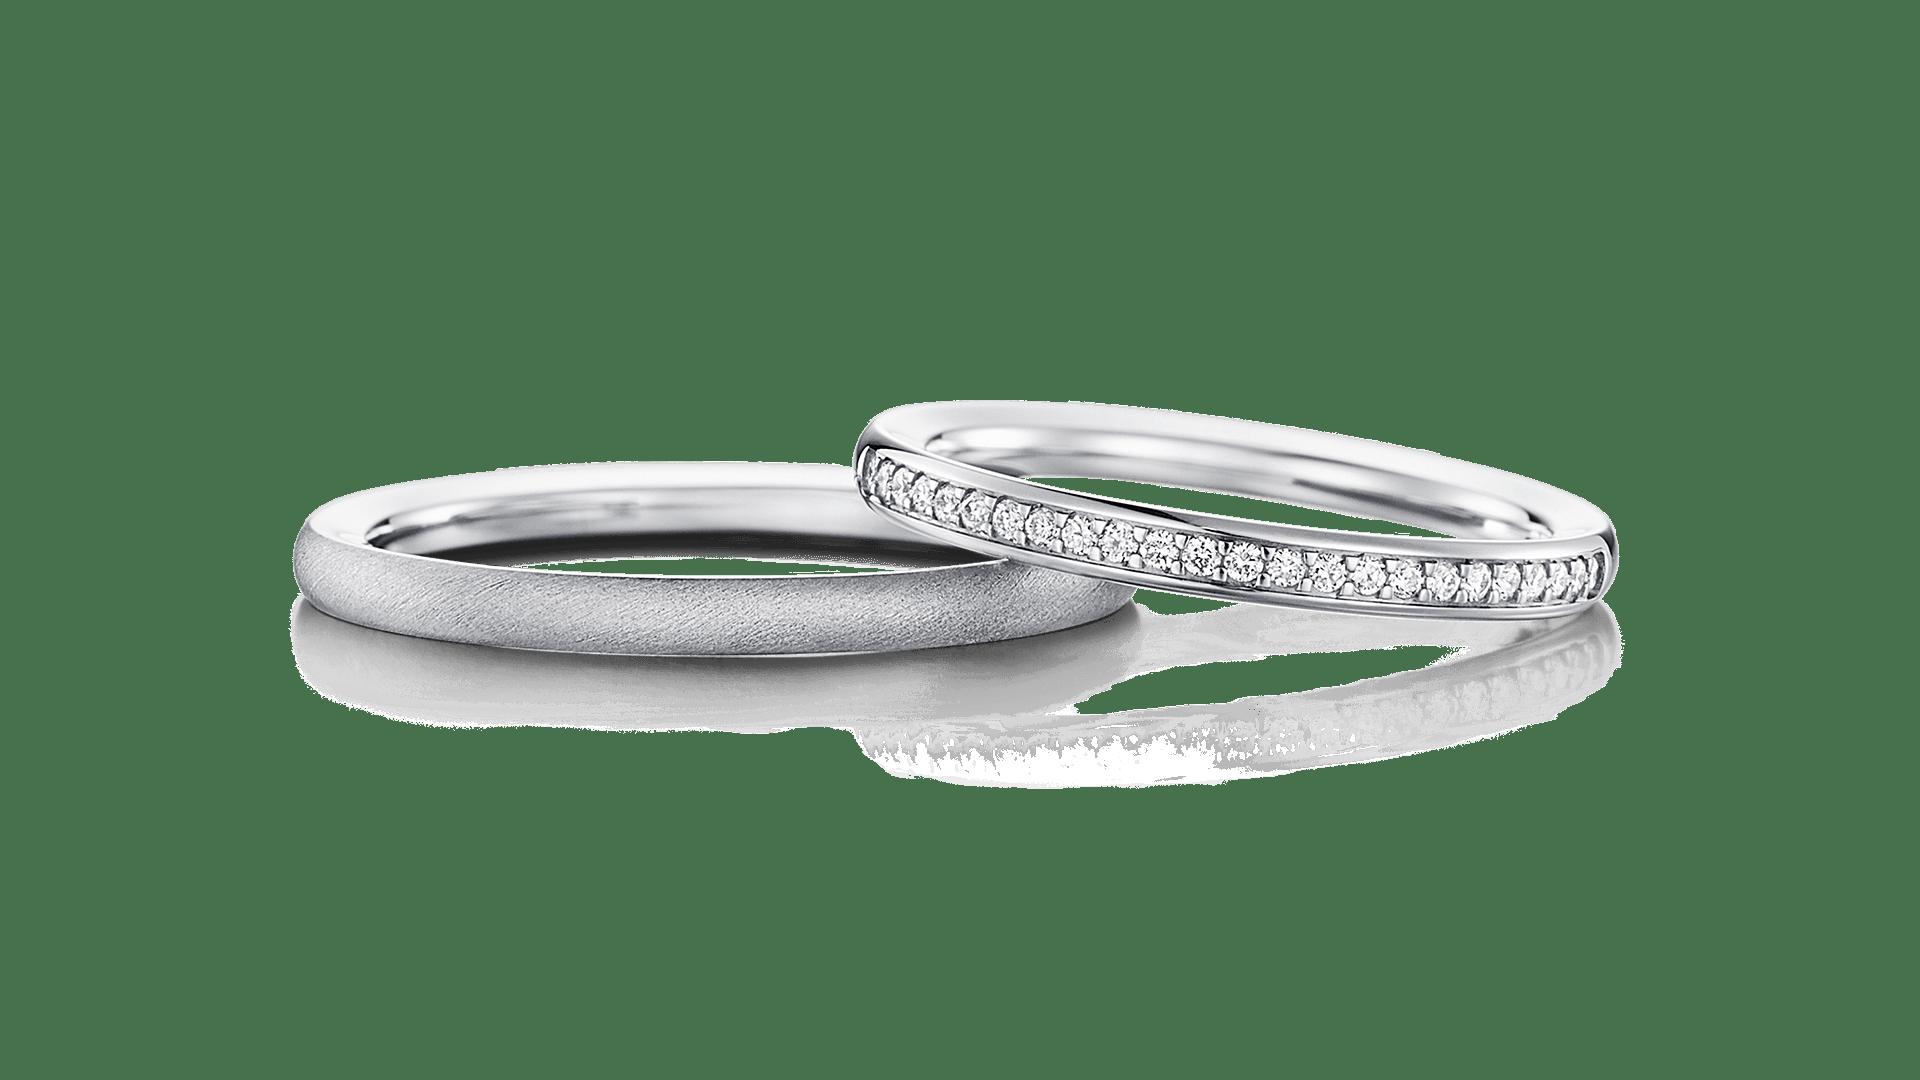 astra H × 24D アストラH×24D | 結婚指輪サムネイル 1